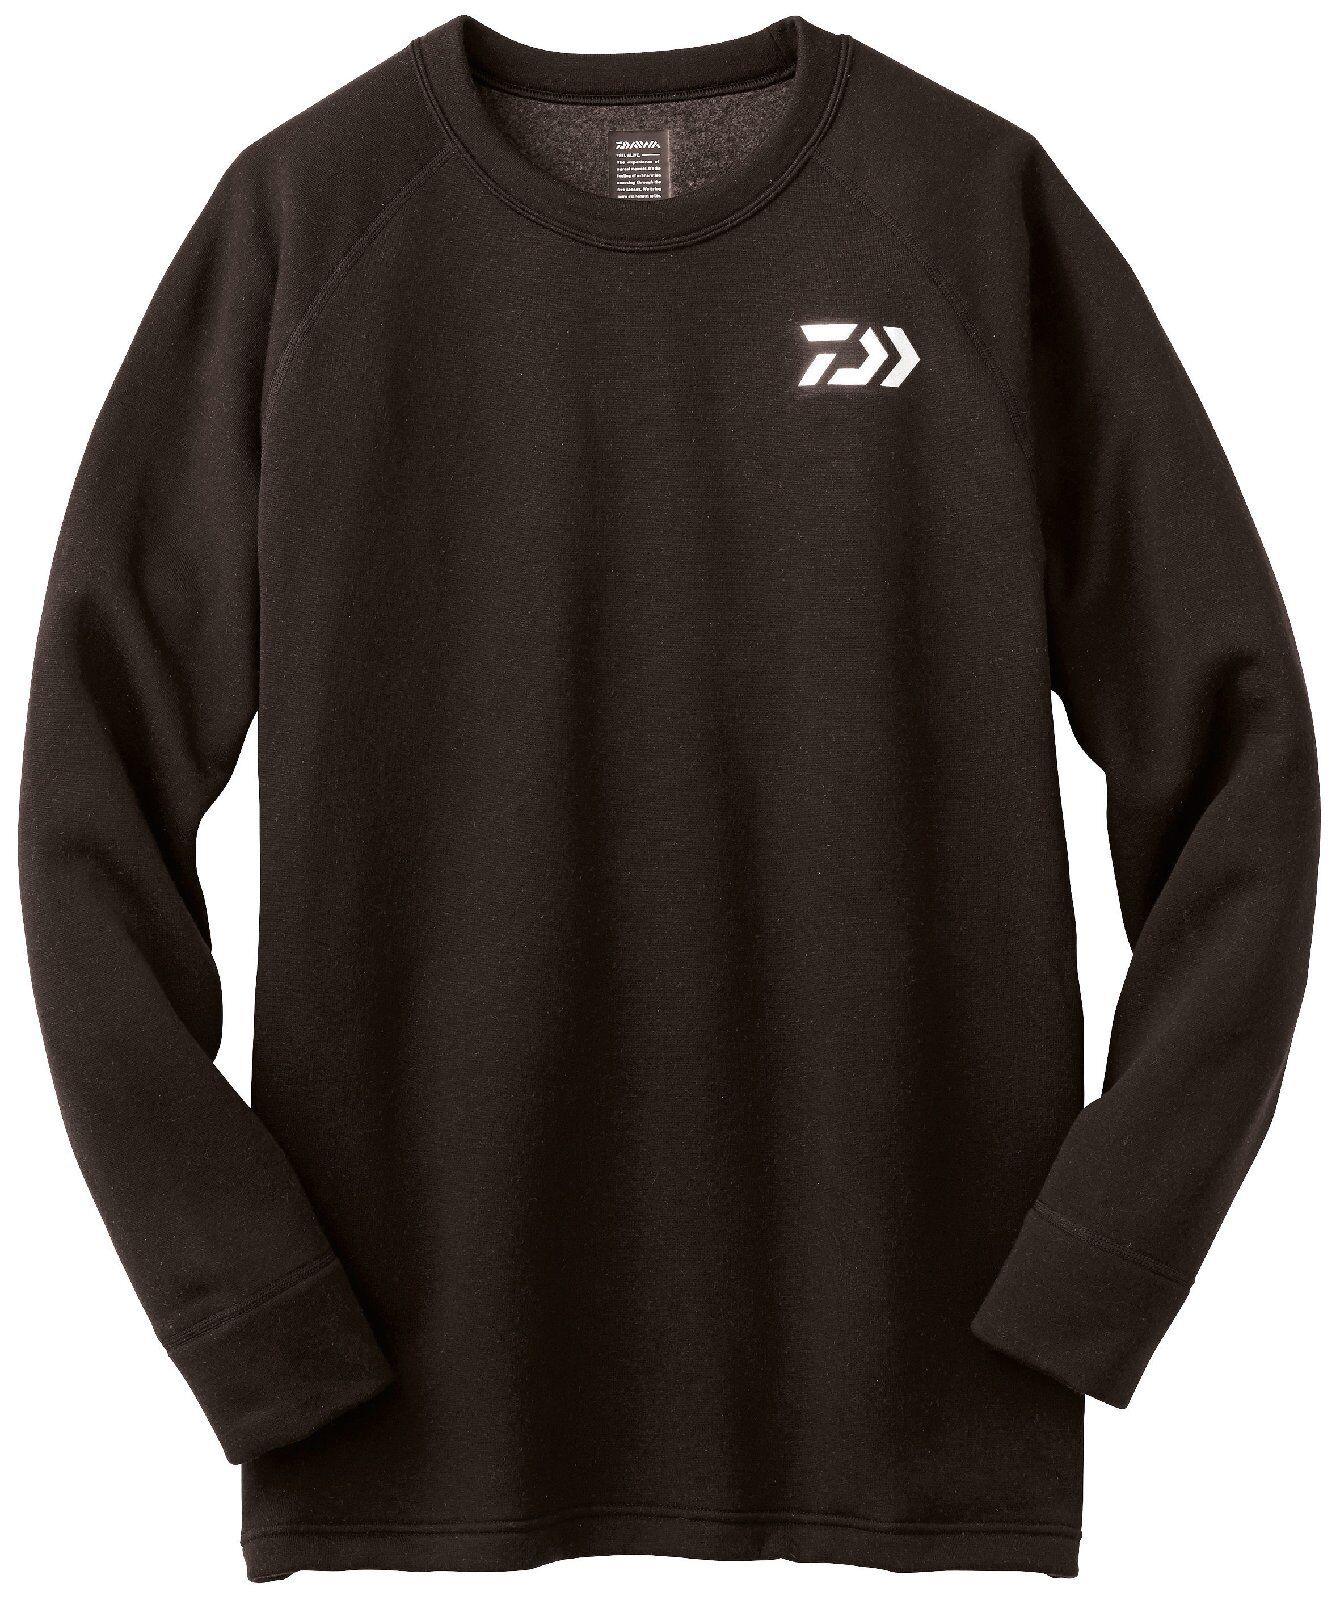 Daiwa Breathmagic Cool Neck Unterhemd 3004S, divertiuominitoktionsShirt, nero